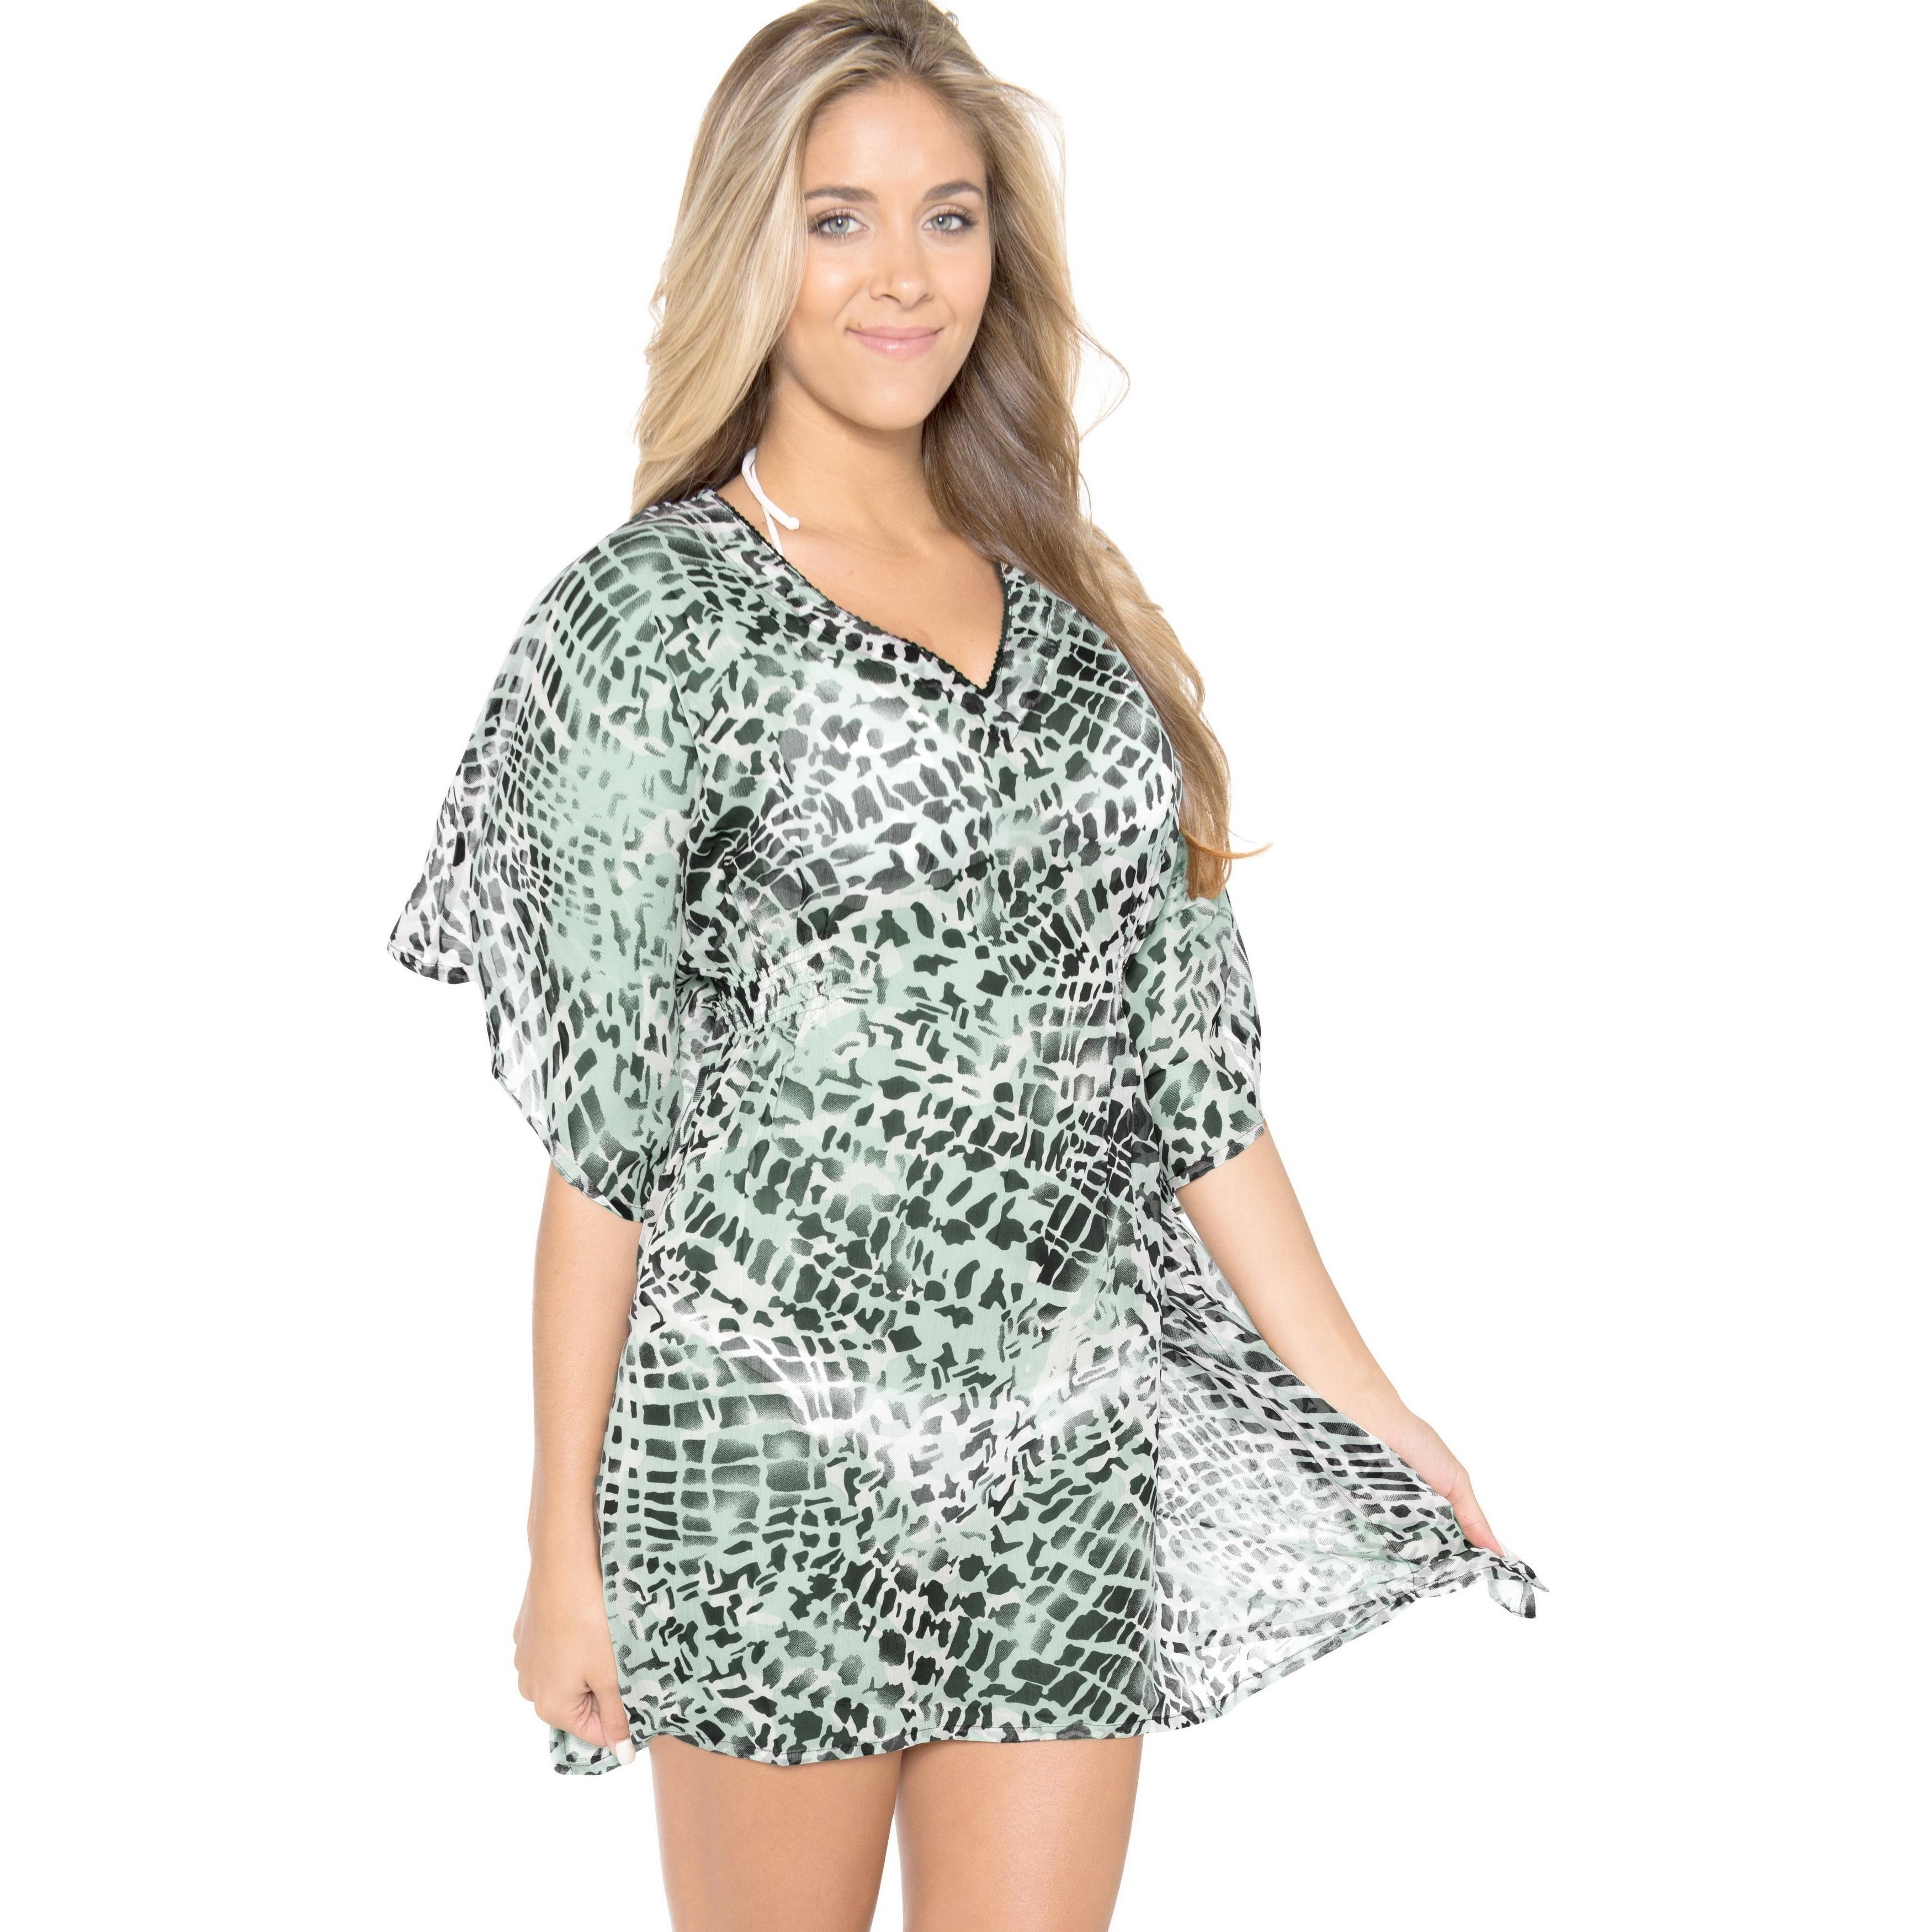 079e86c8442 La Leela Pair UP Bathing Suit Swimwear Hawaii Miami Resortwear Bikini Cover  up Green